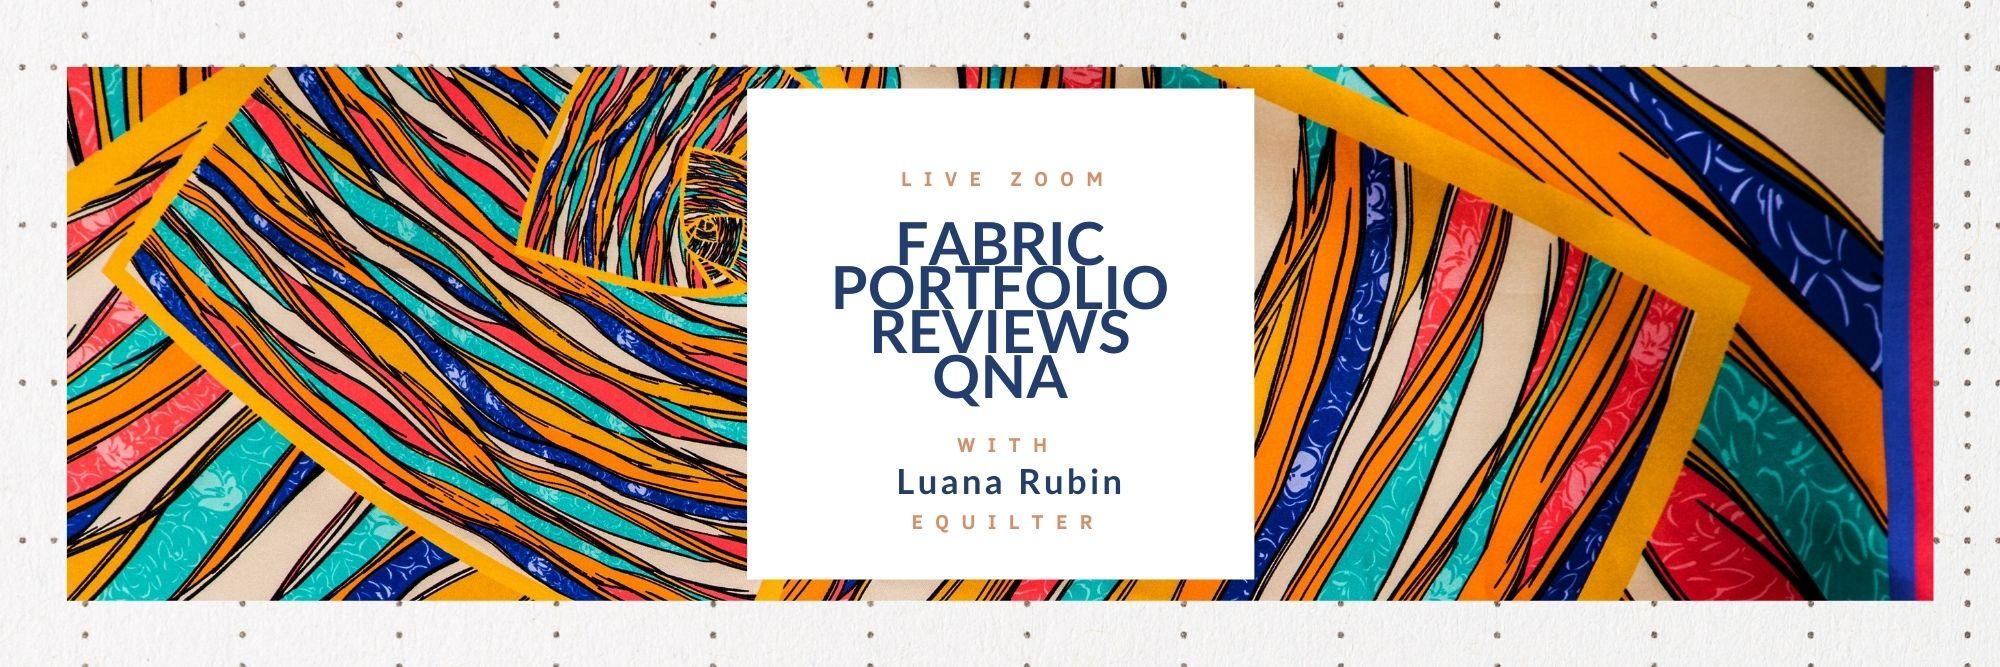 fabric-qna-banner